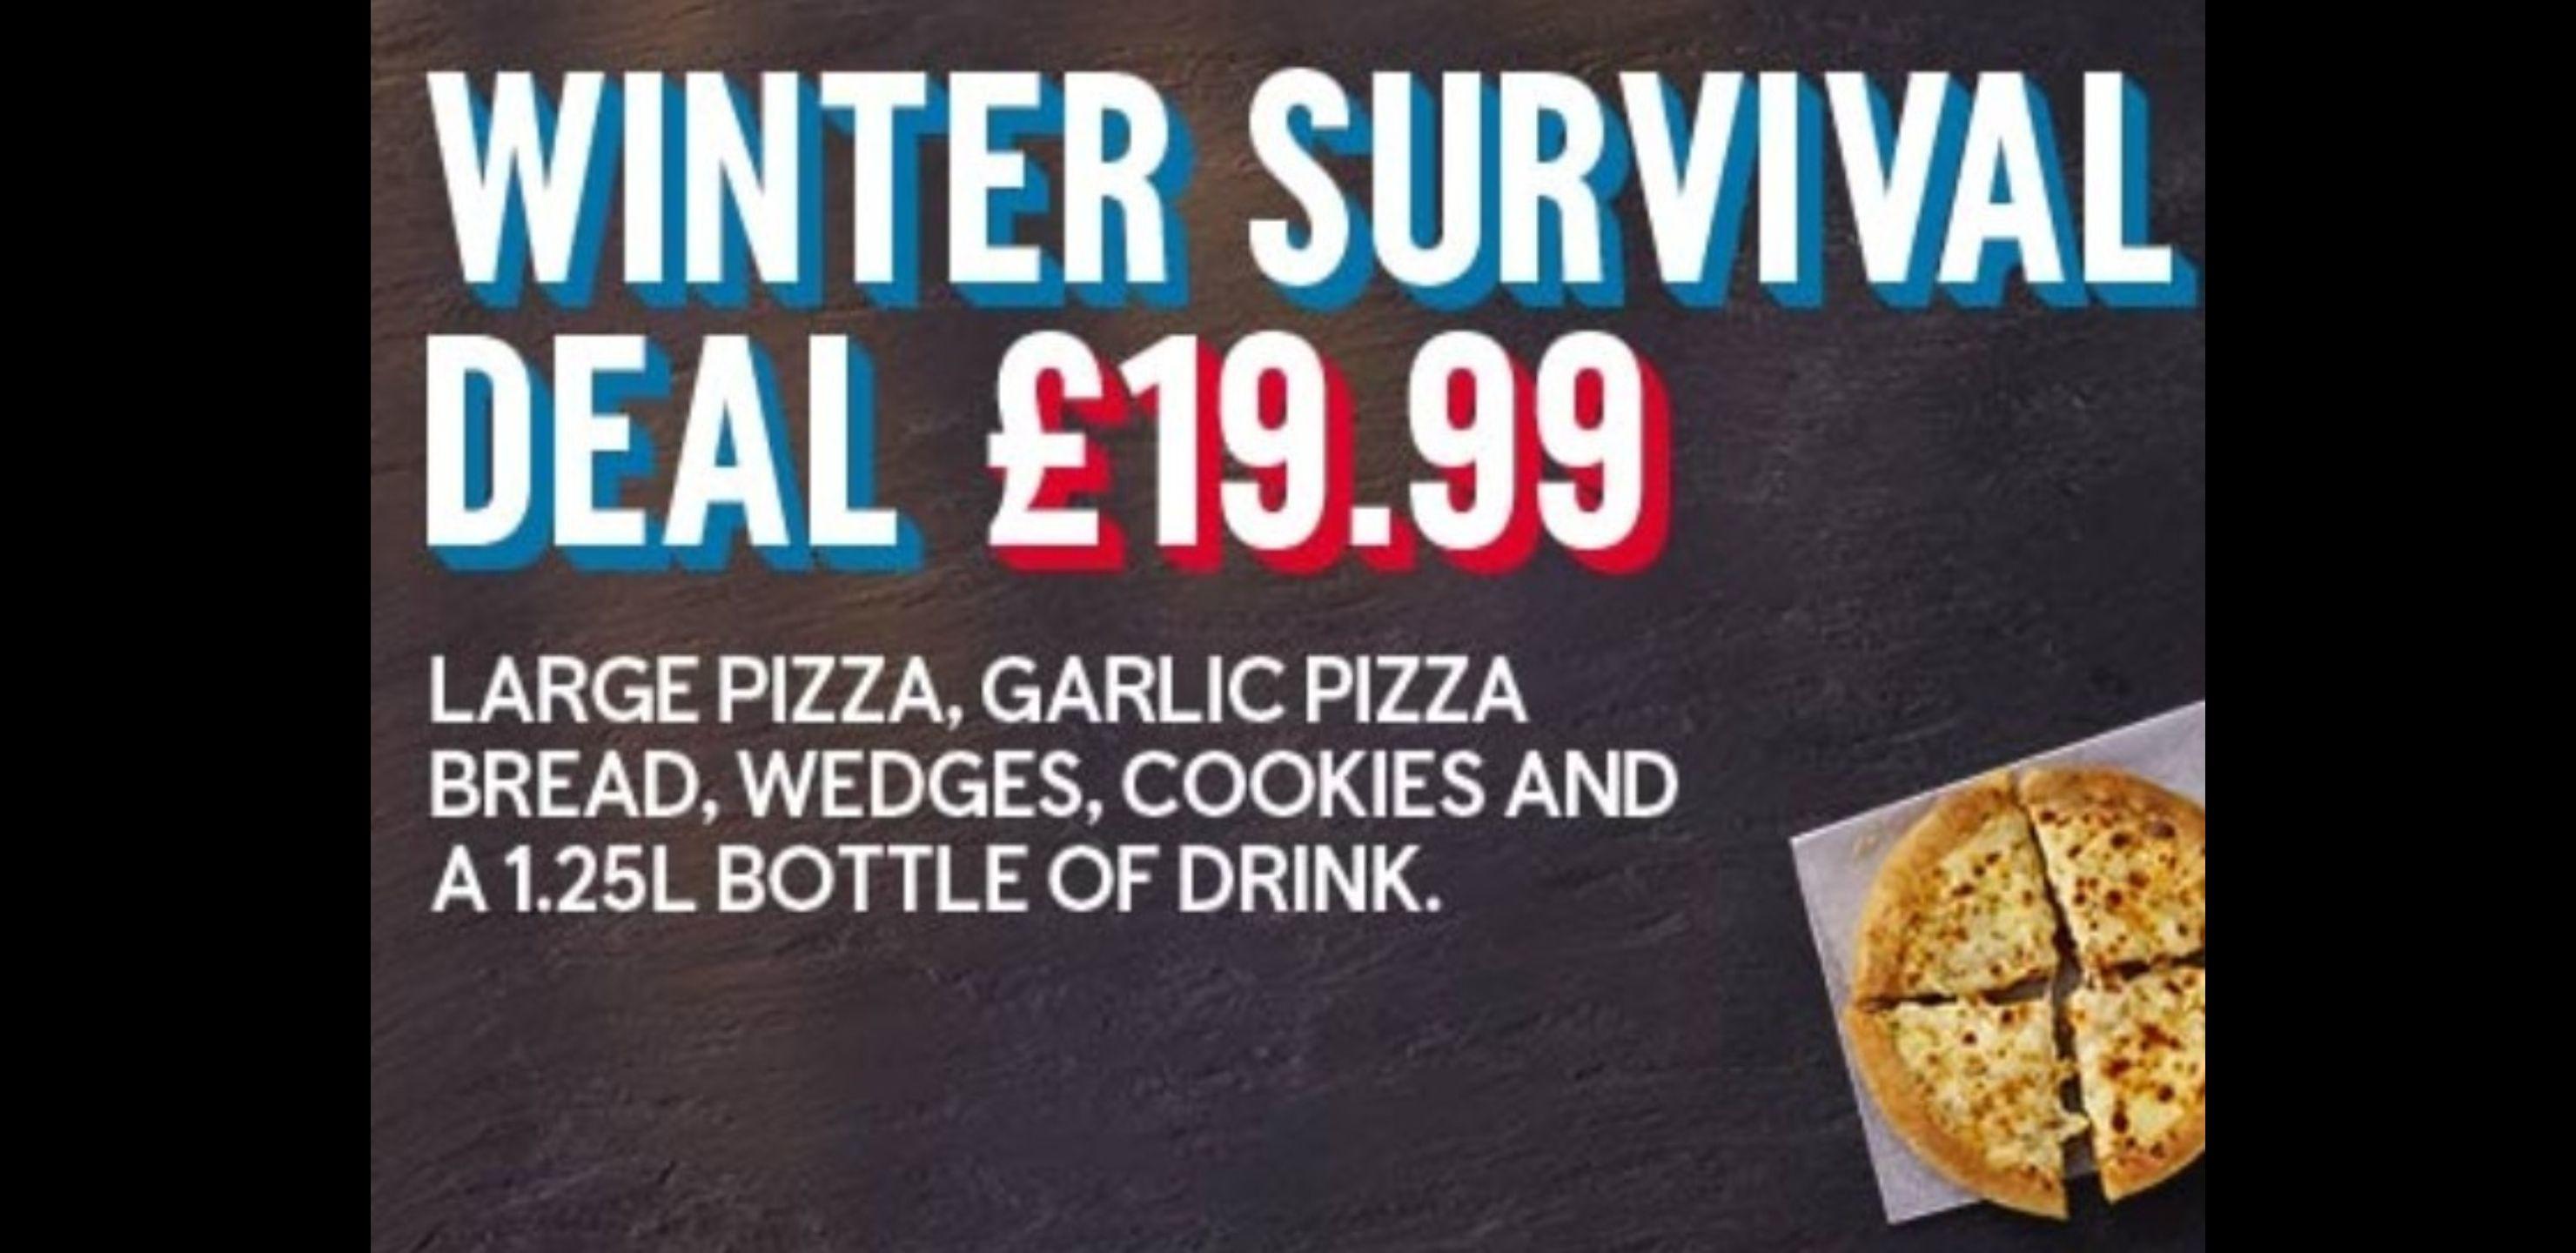 Dominos Winter Survival Deal £19.99 (Normally £25+)